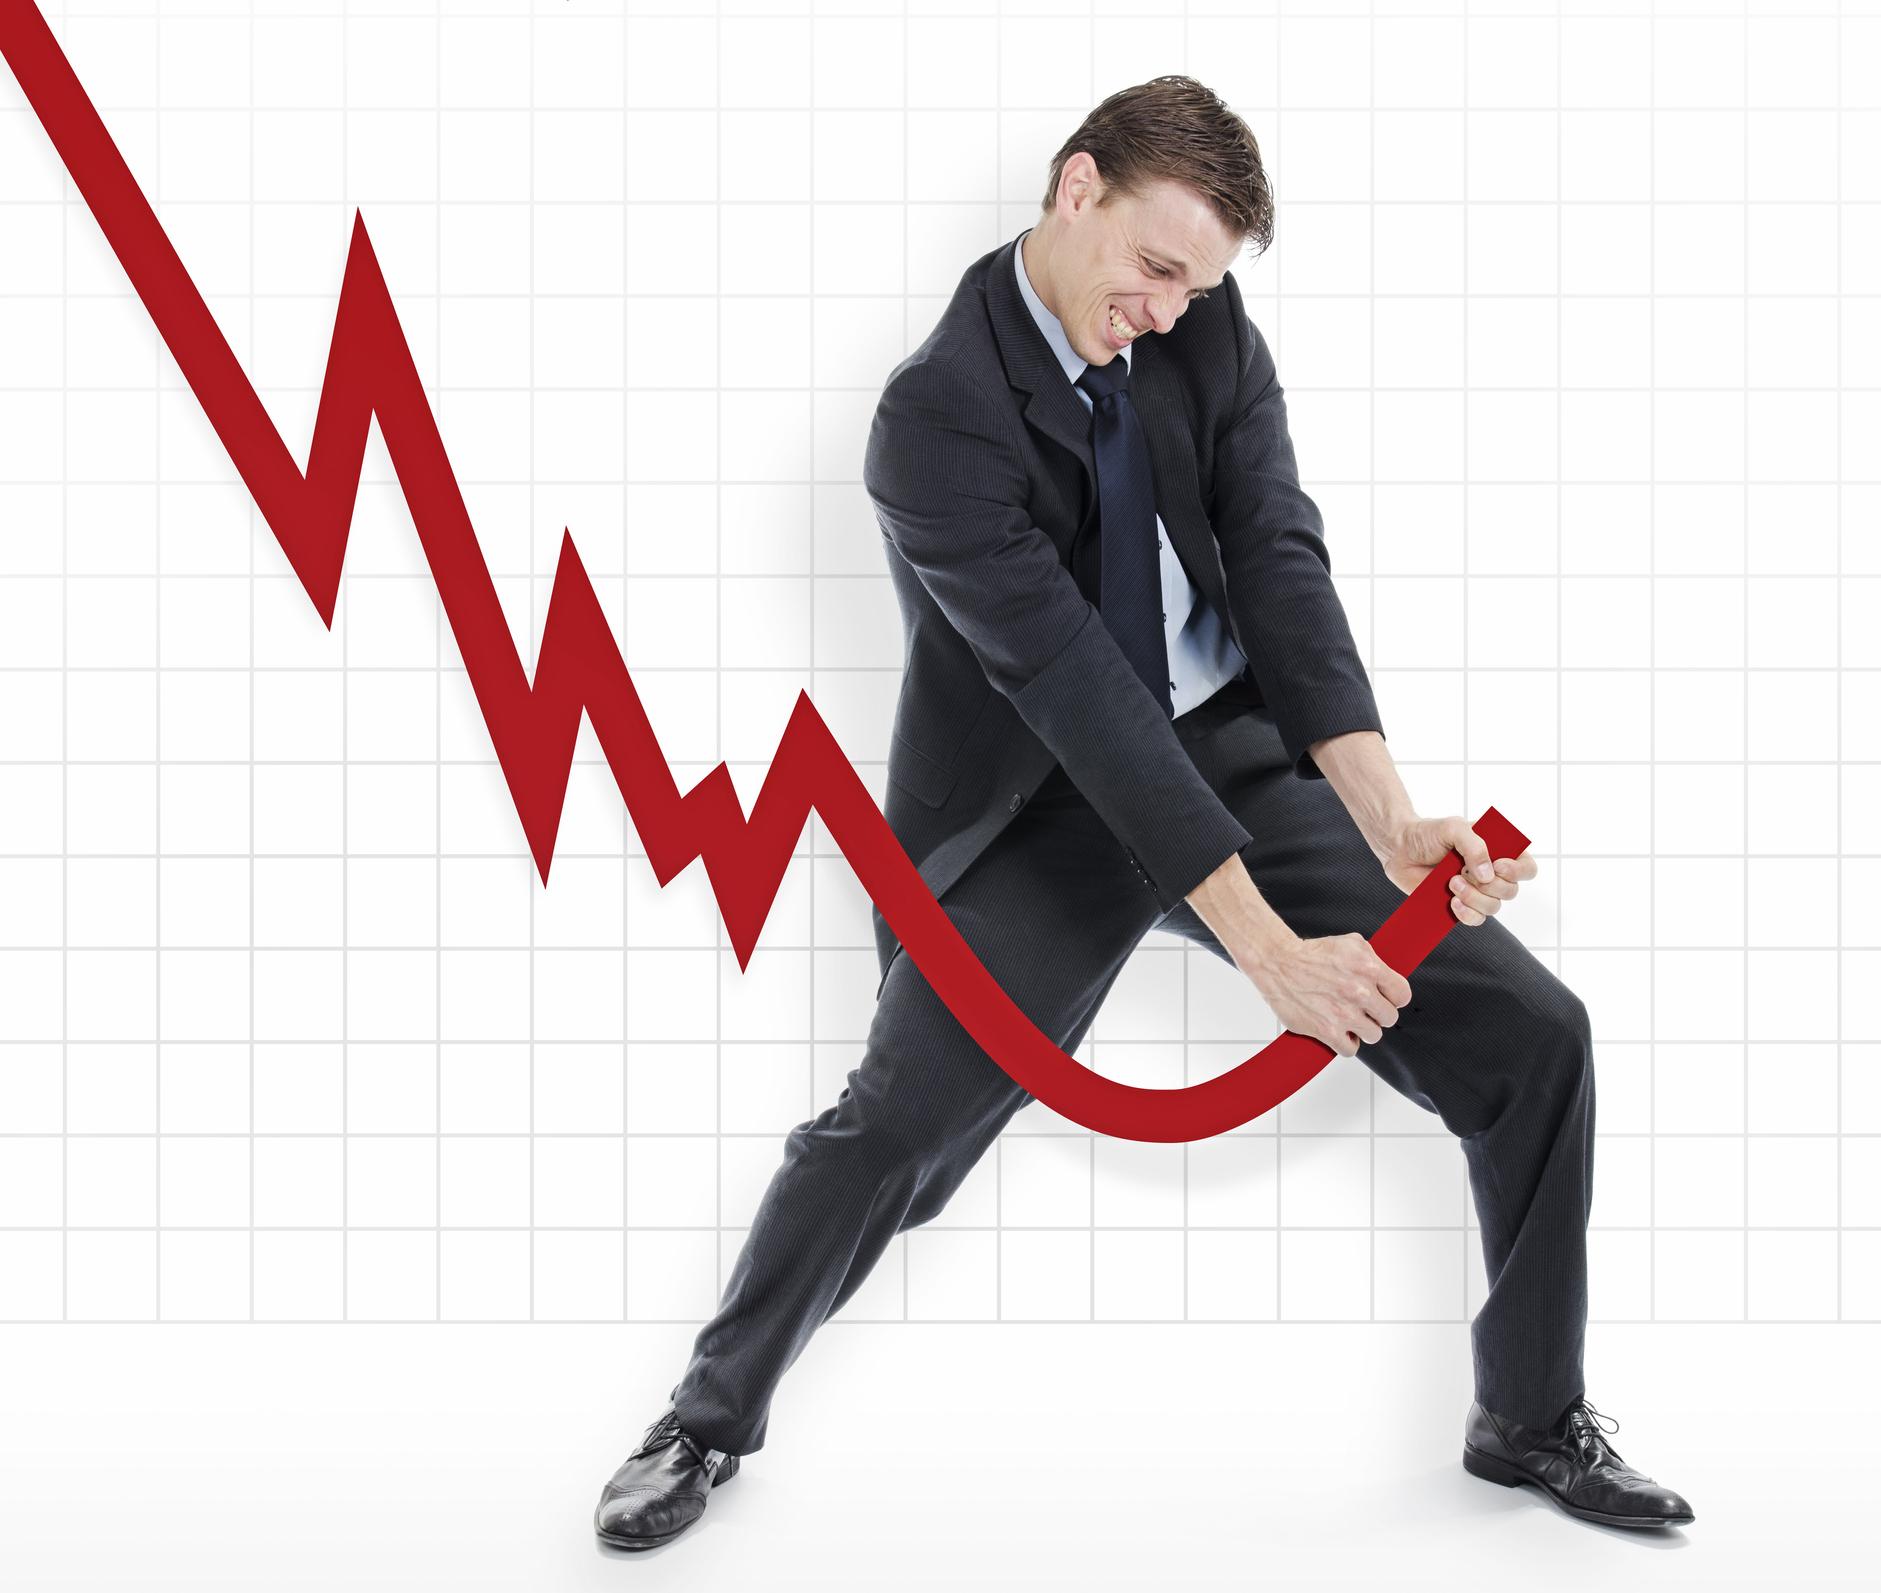 Man in a suit bending a downward trending red line upward.